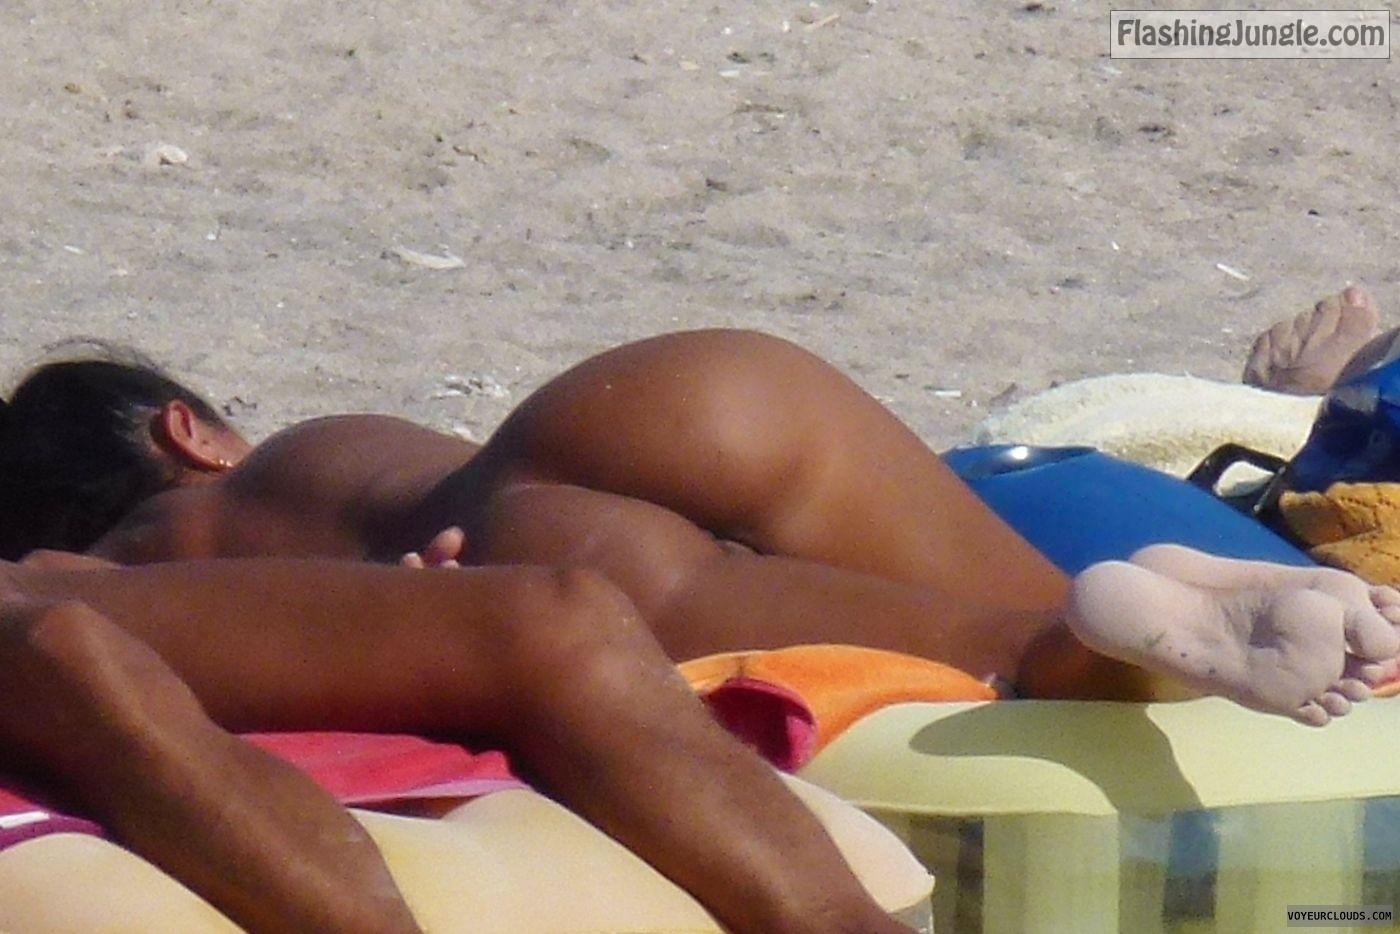 Real Nudity Pussy Flash Pics Public Nudity Pics Nude Beach Pics Ass Flash Pics